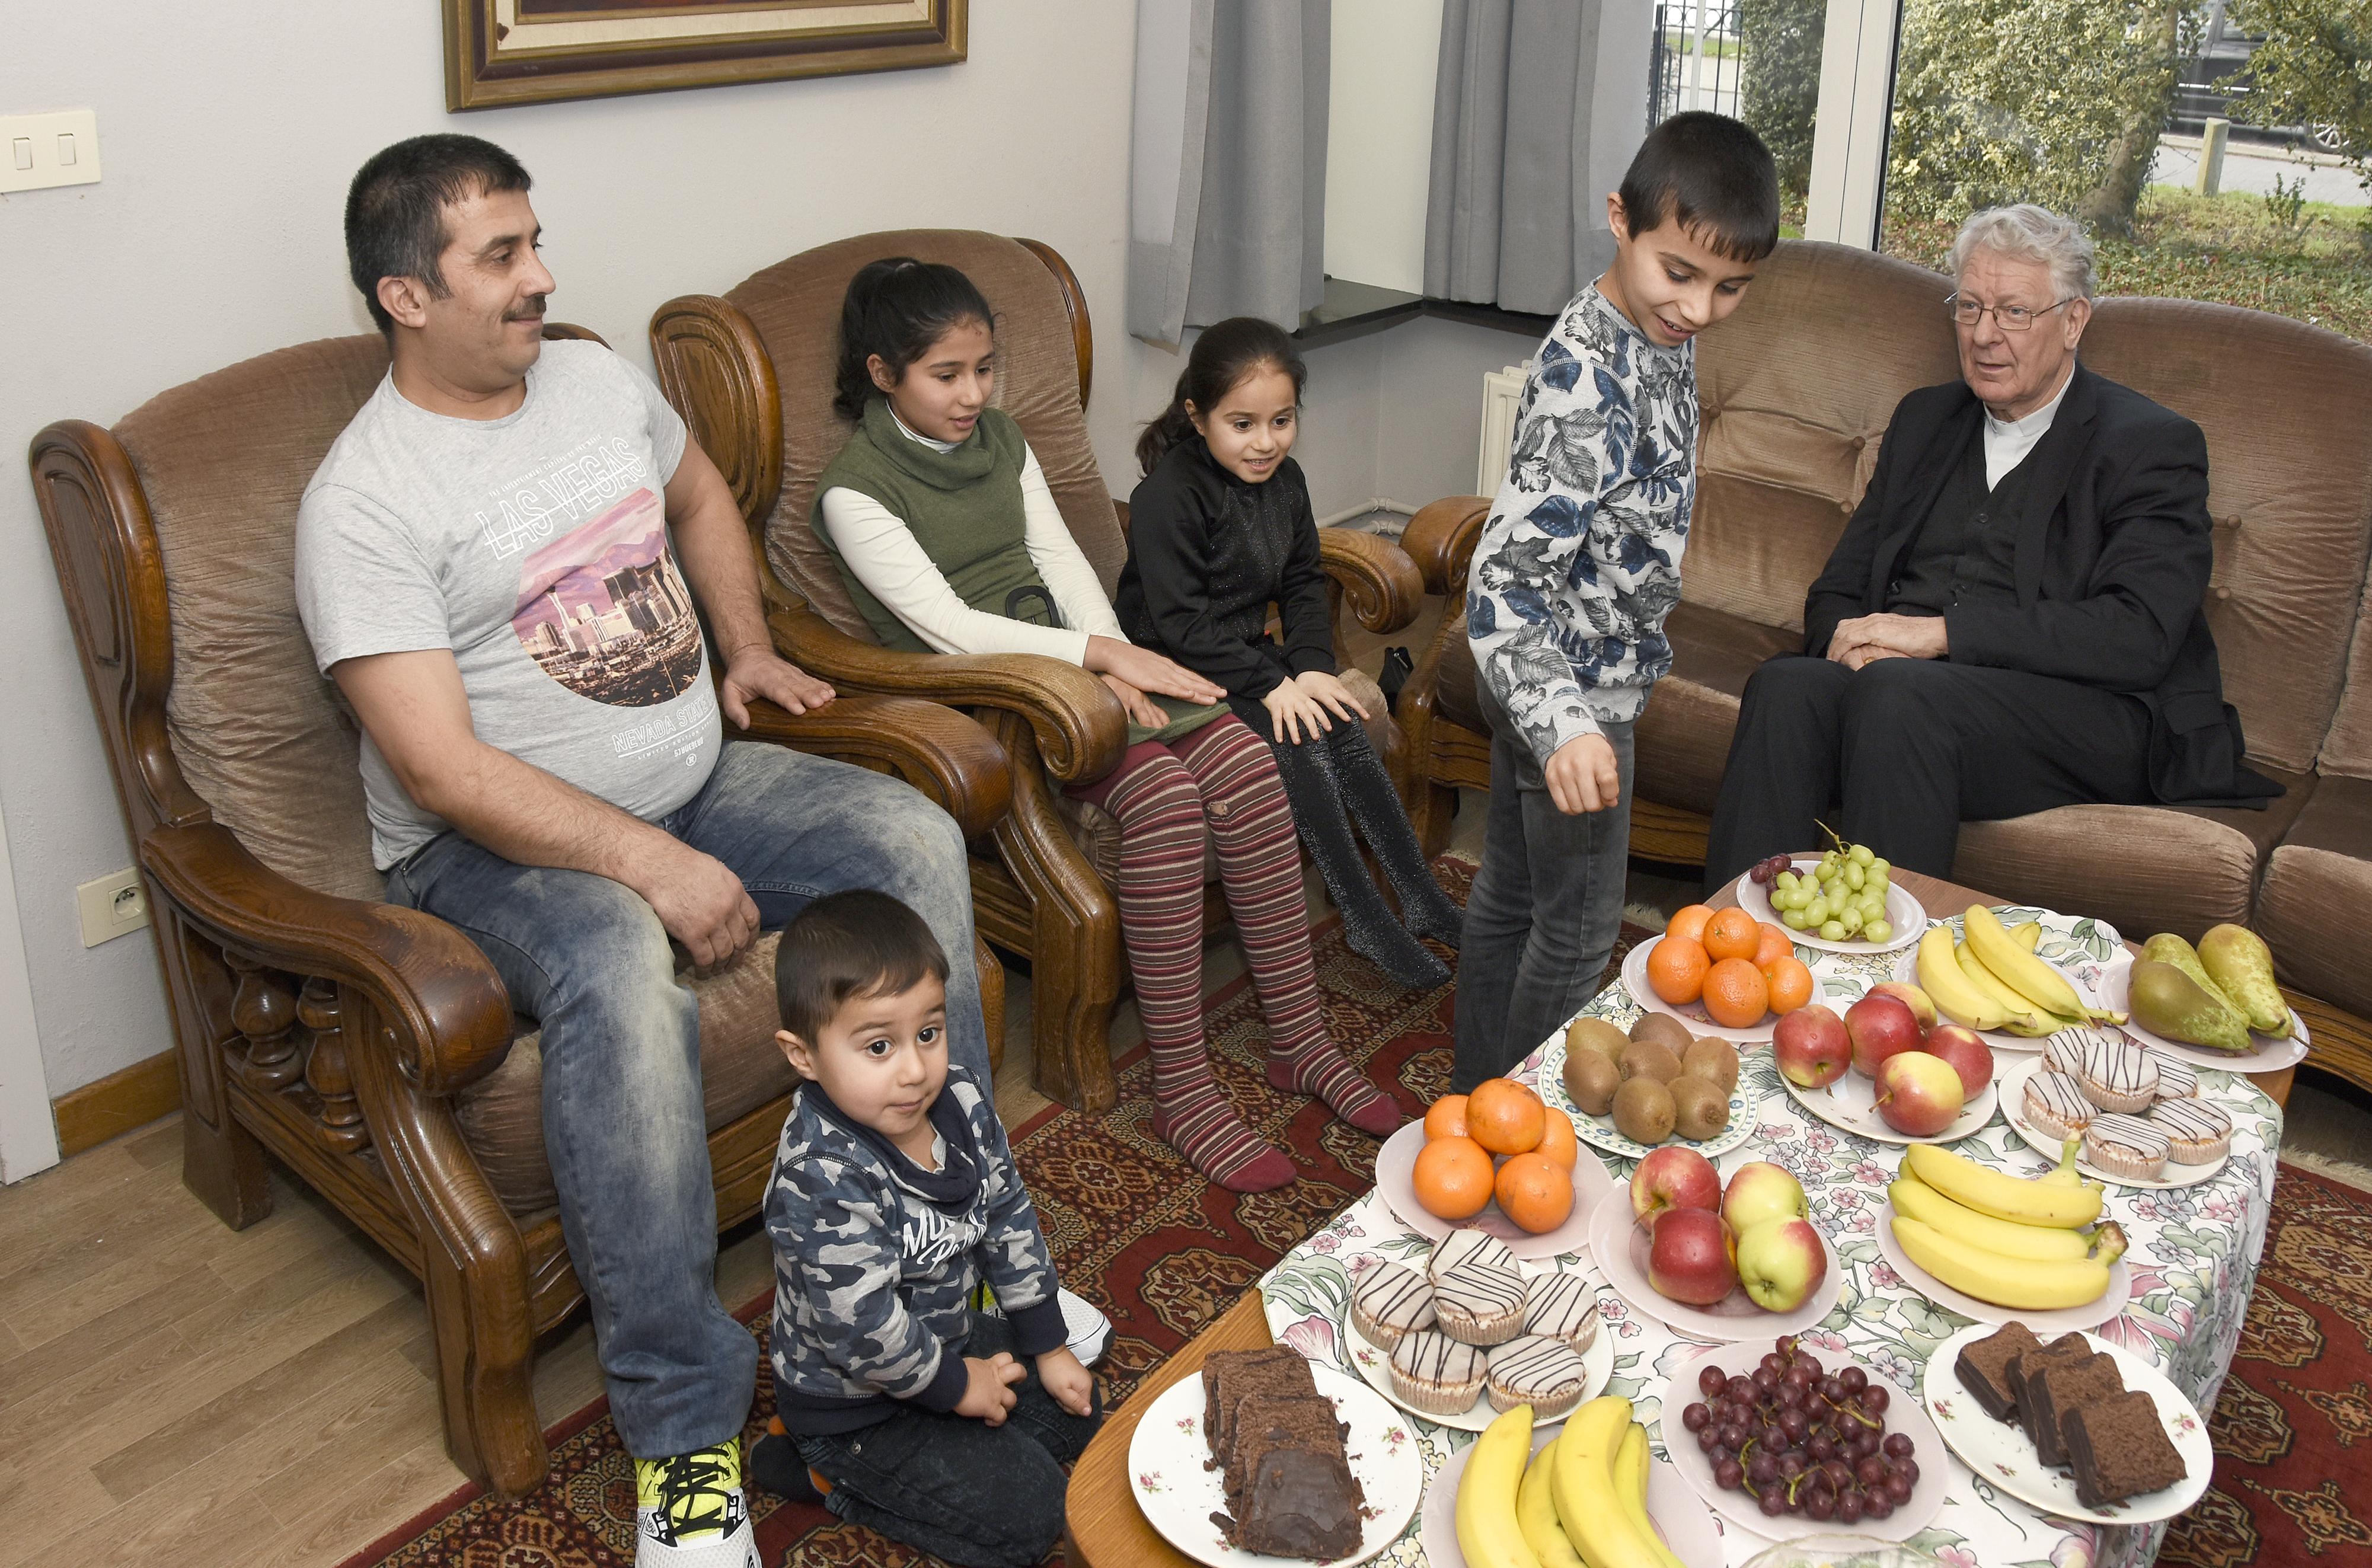 Met Syrische familie in Bassevelde © Maîtrise